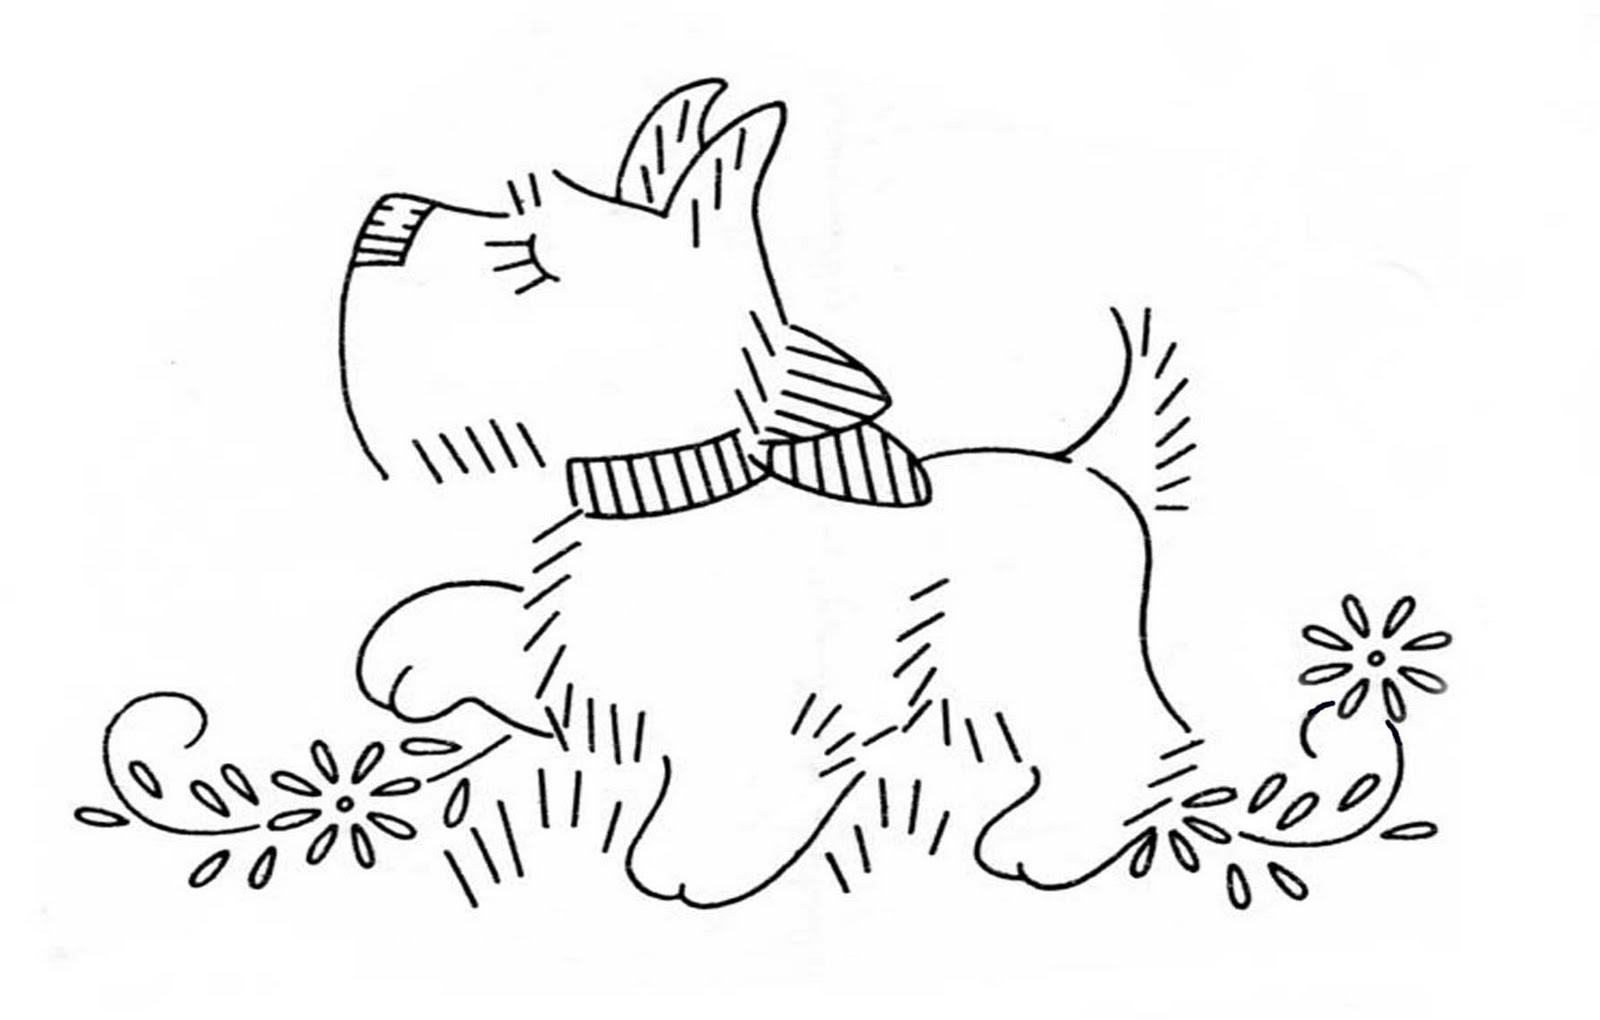 THETINCAT: Scottie dog embroidery Patterns